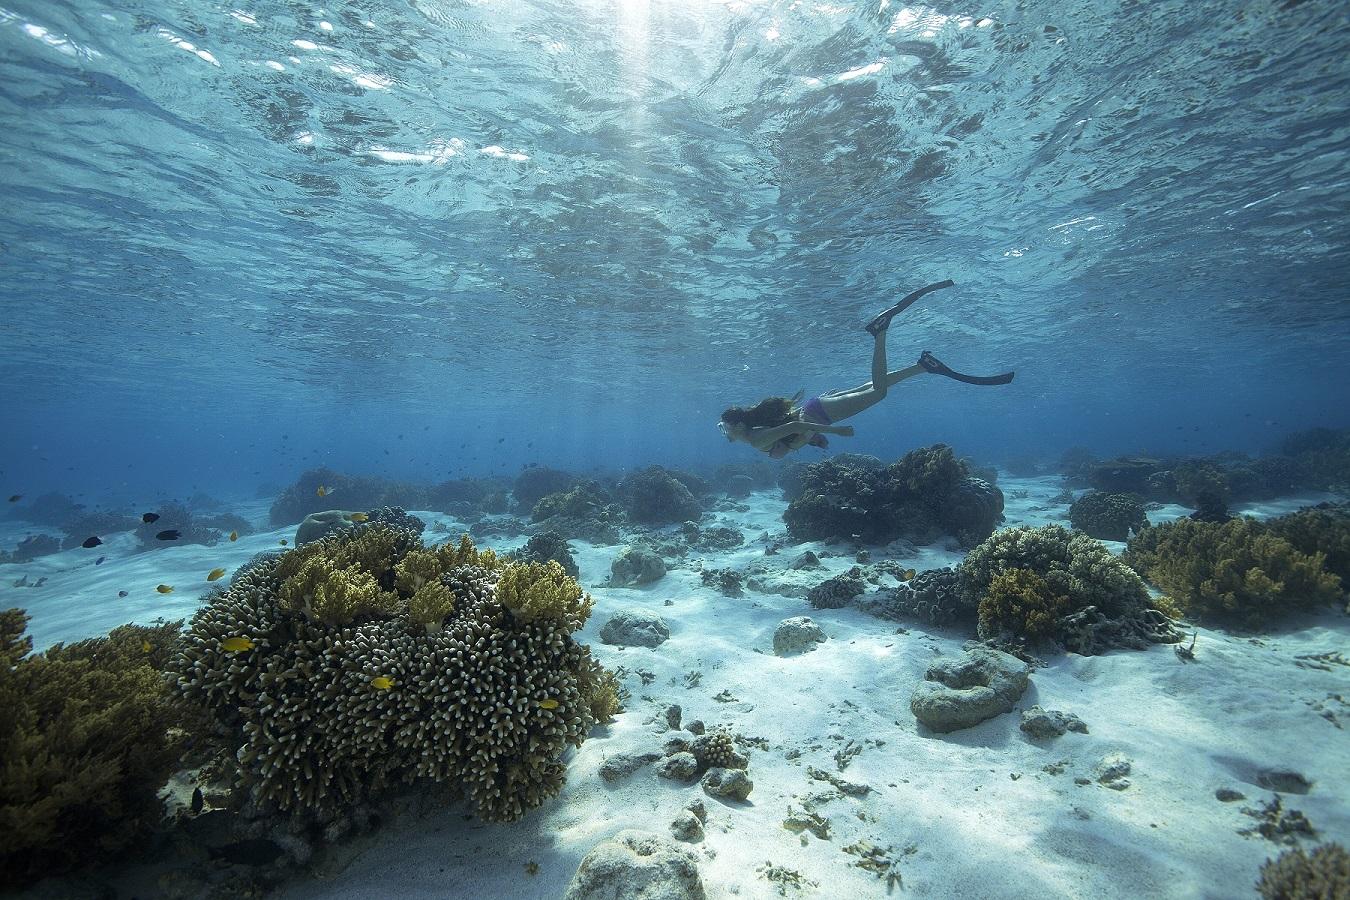 UY_Andaman Islands_03.jpg